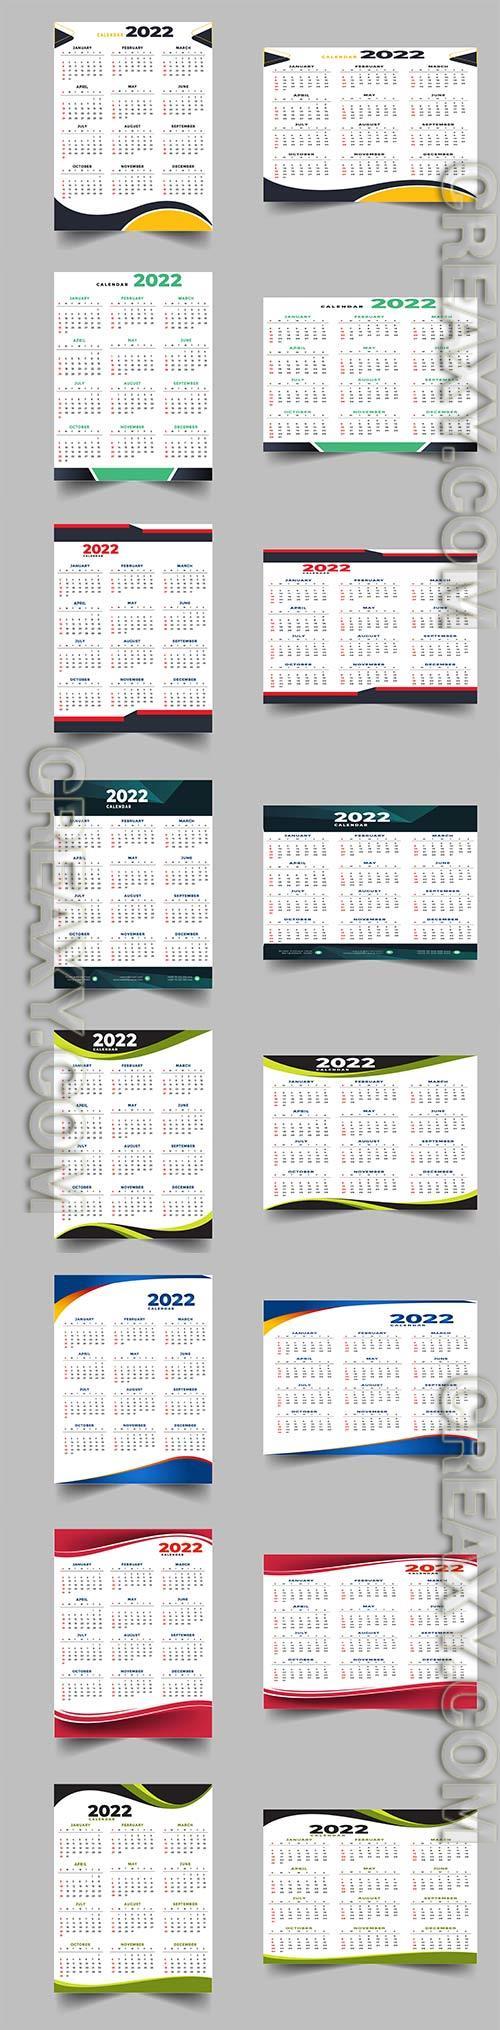 2022 calendar design template premium vector